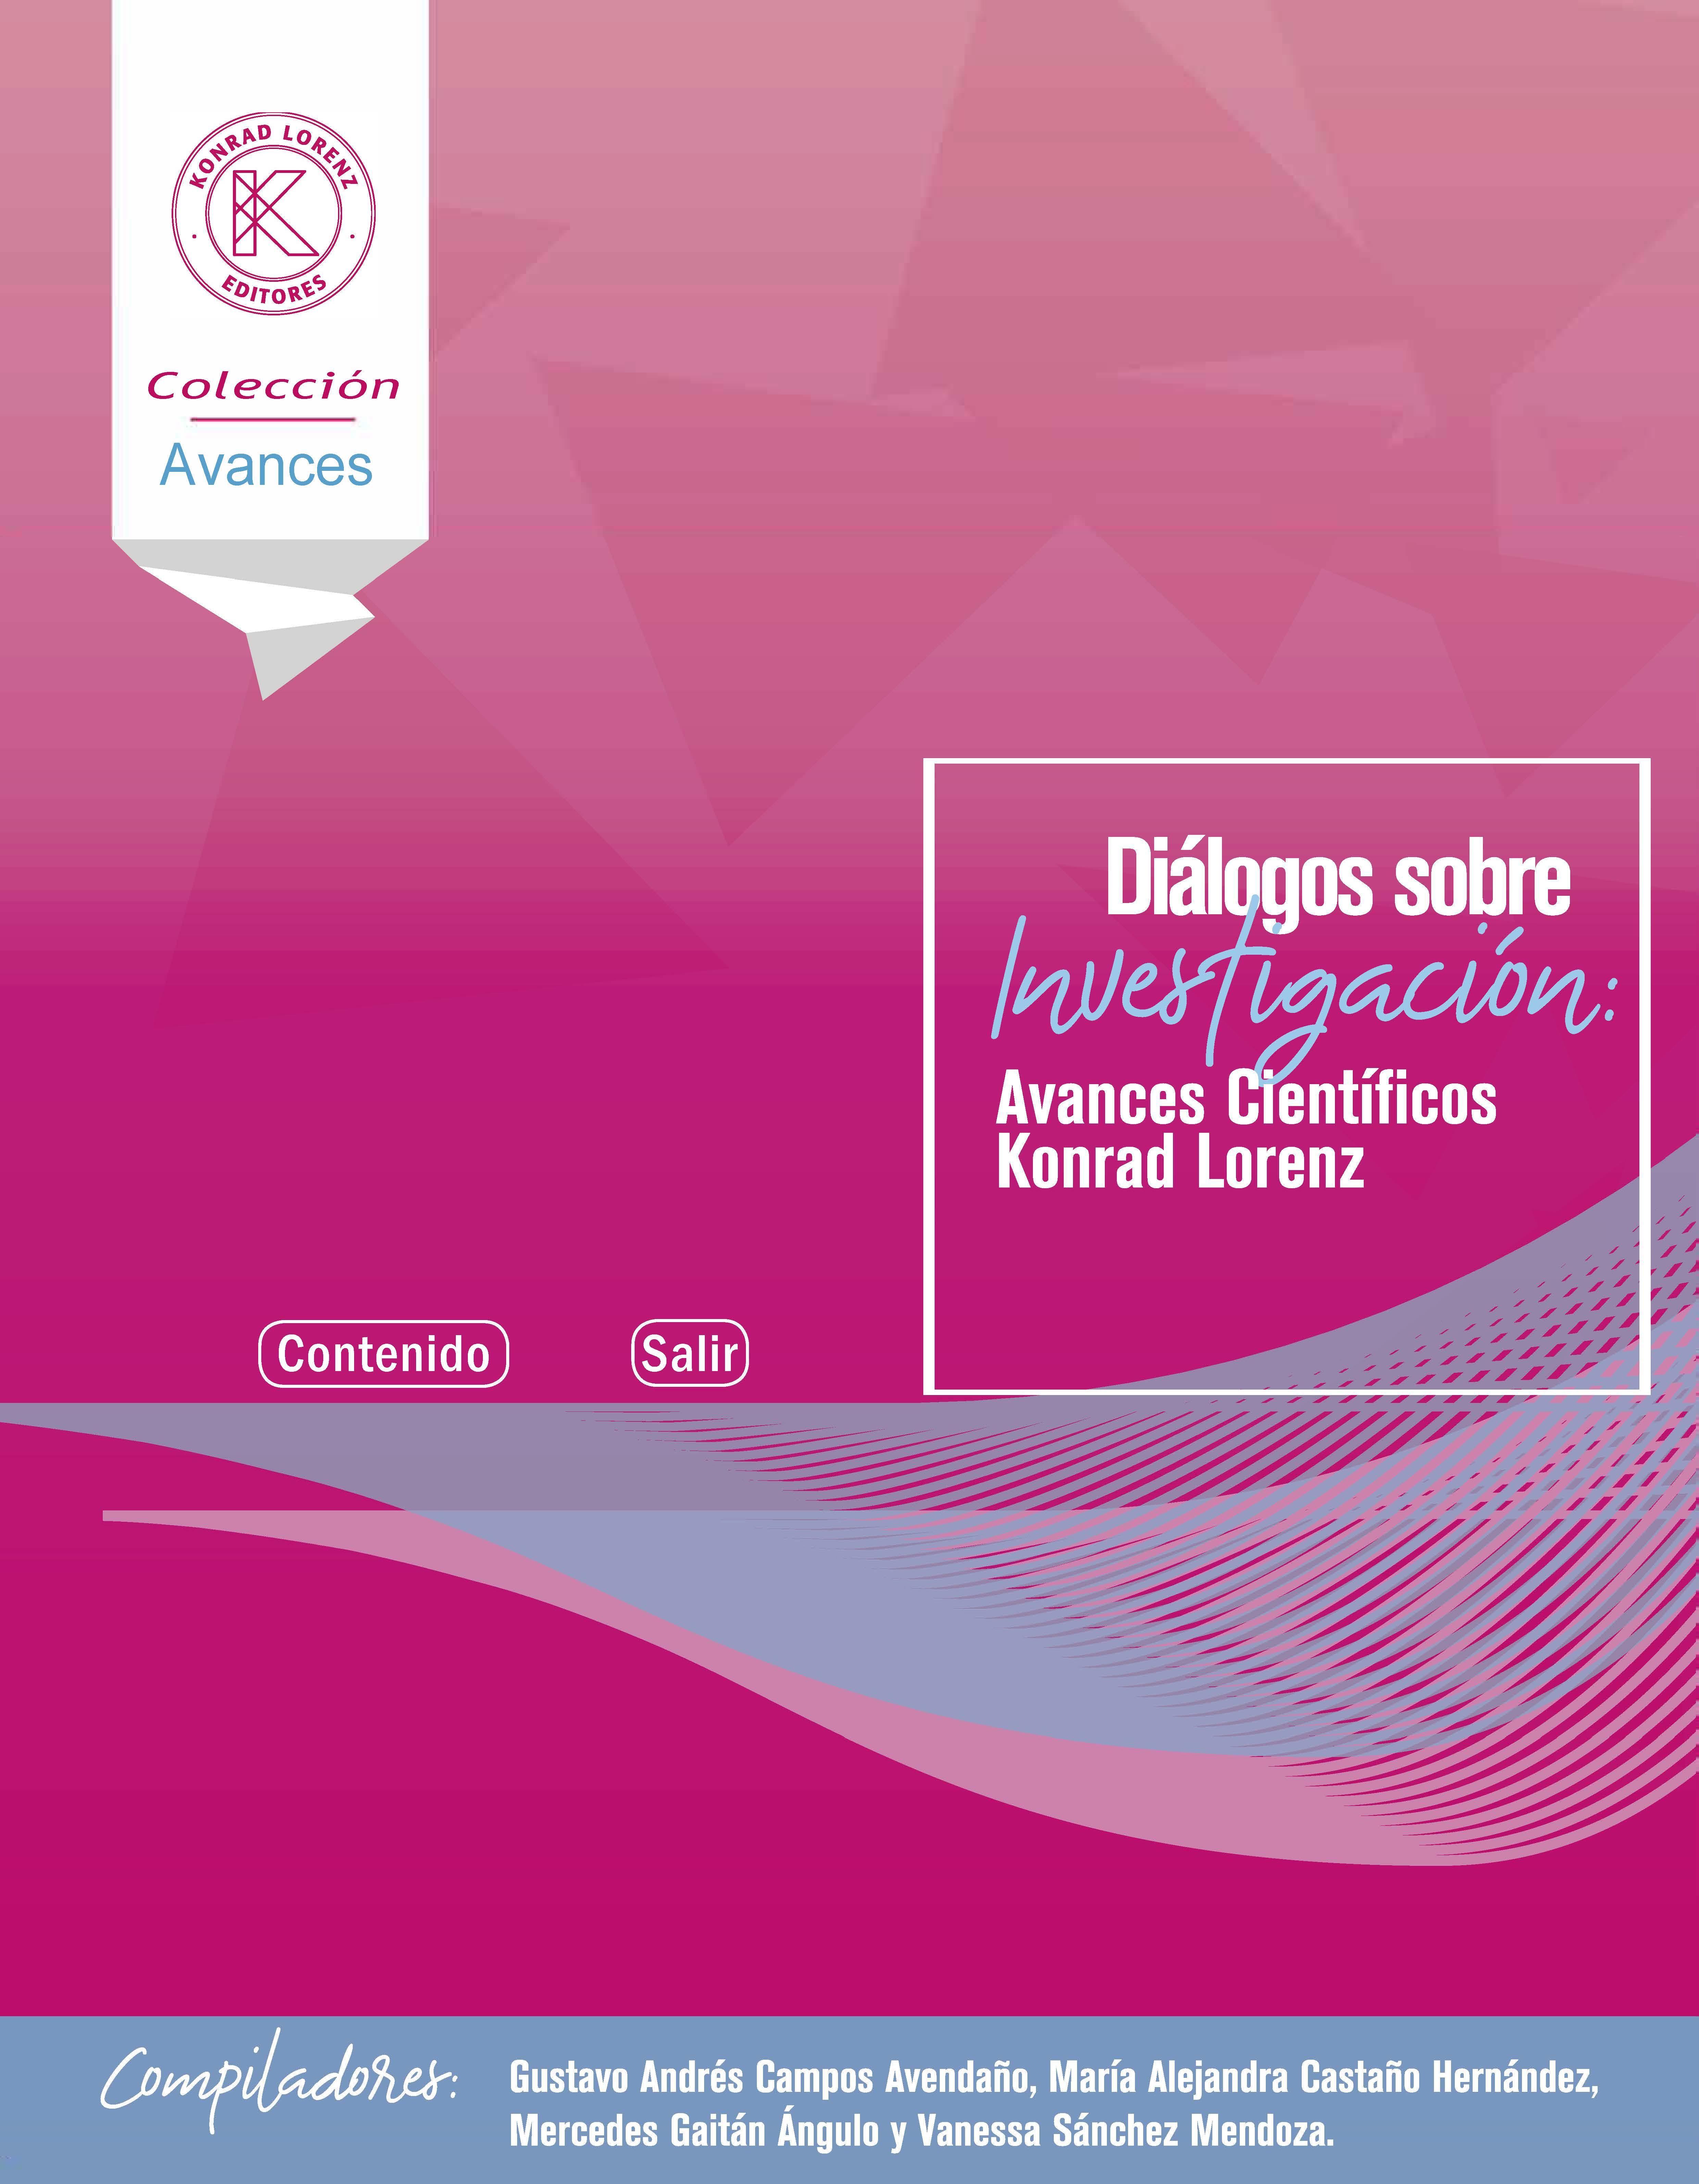 Diálogos sobre Investigación: Avances Científicos Konrad Lorenz